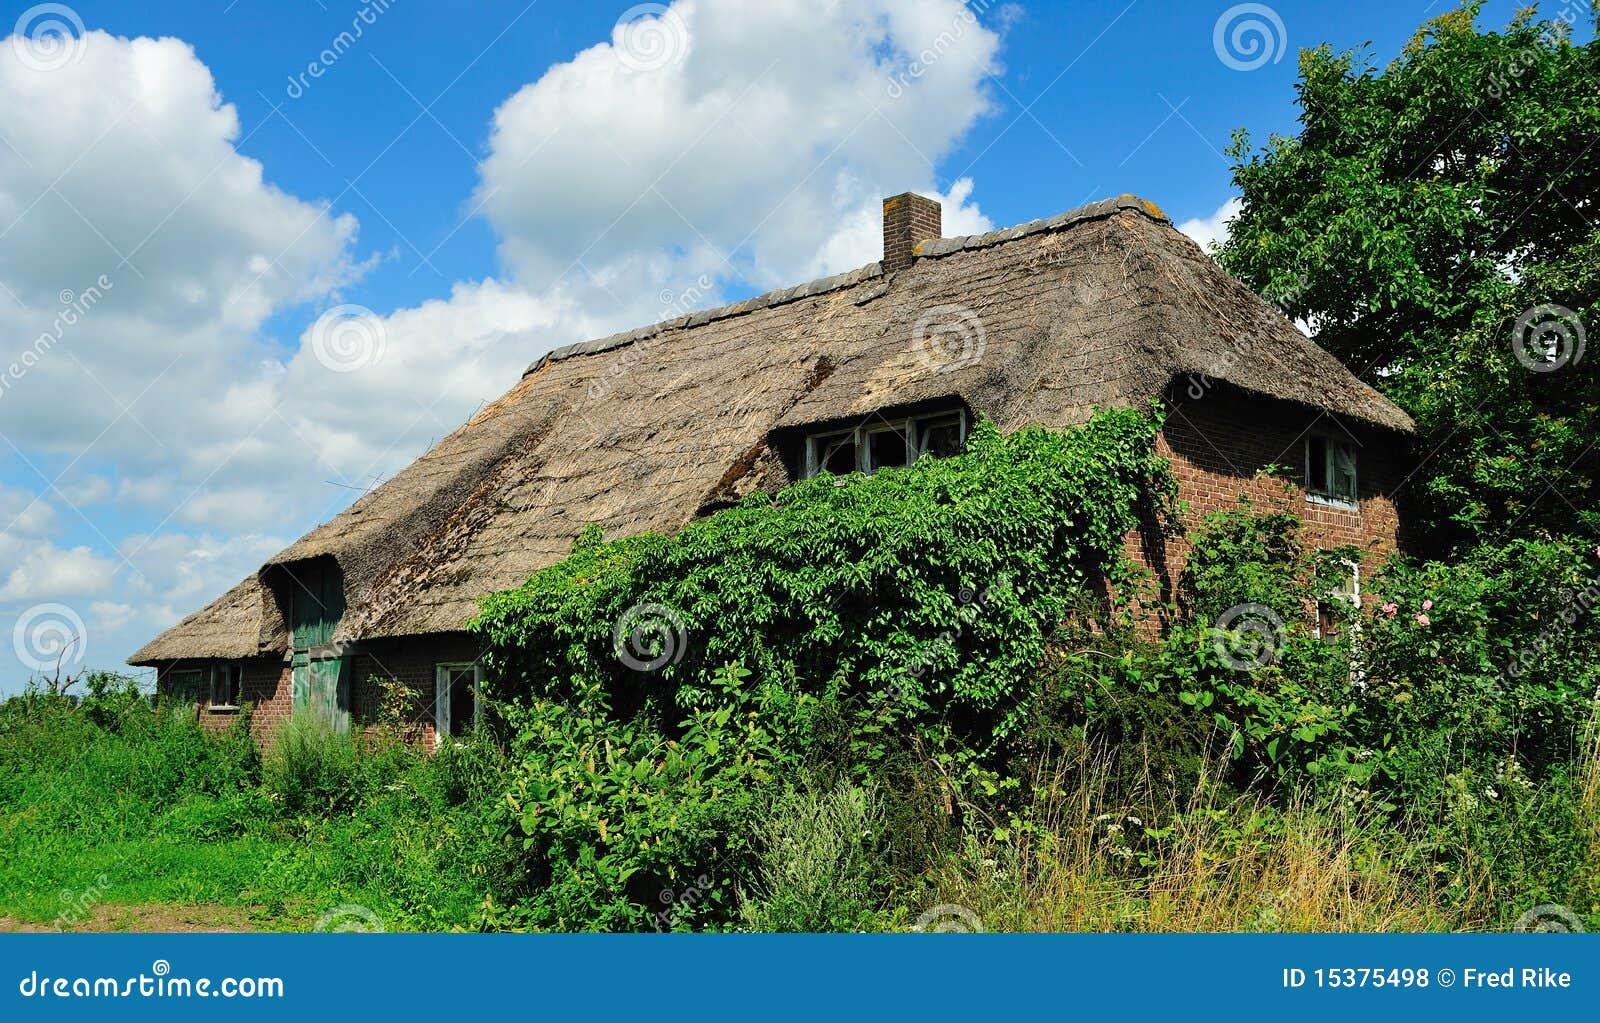 Old dutch farm royalty free stock photos image 15375498 for Farm house netherlands